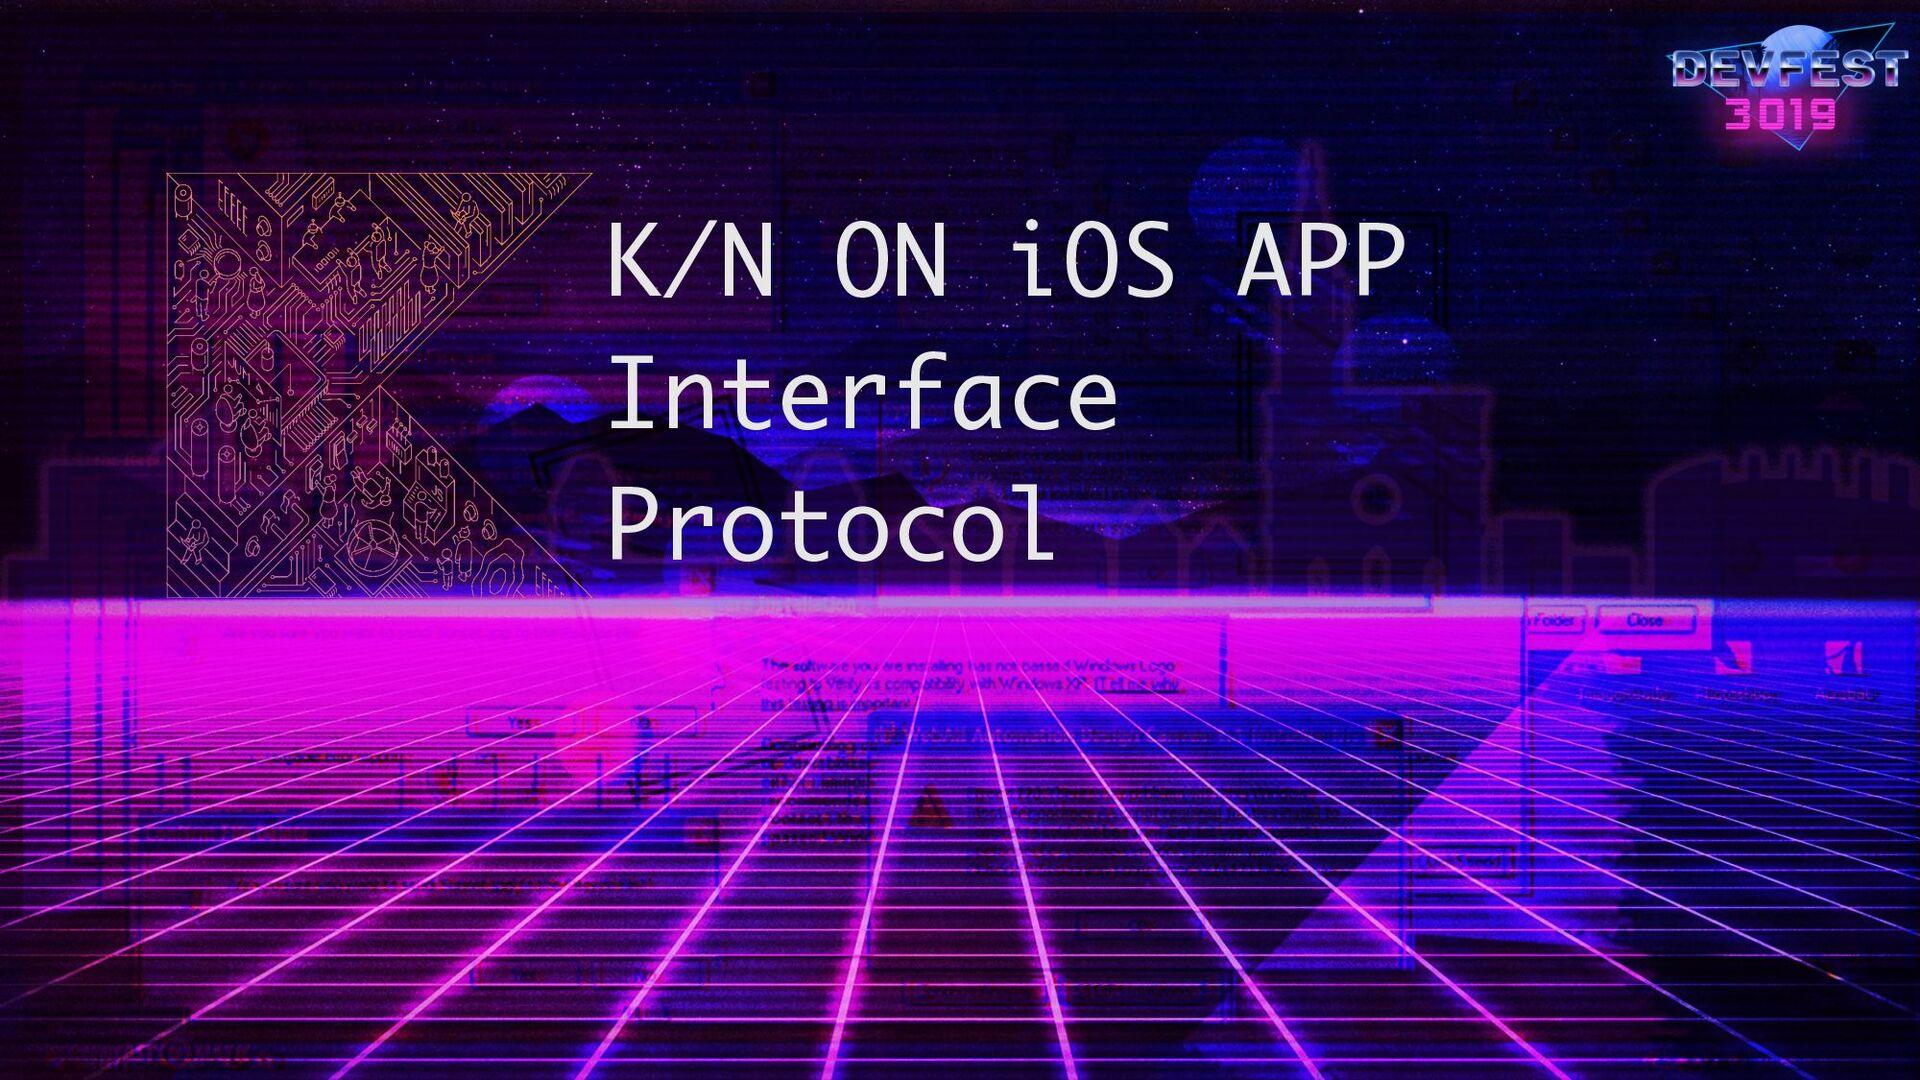 K/N ON iOS APP Interface Protocol